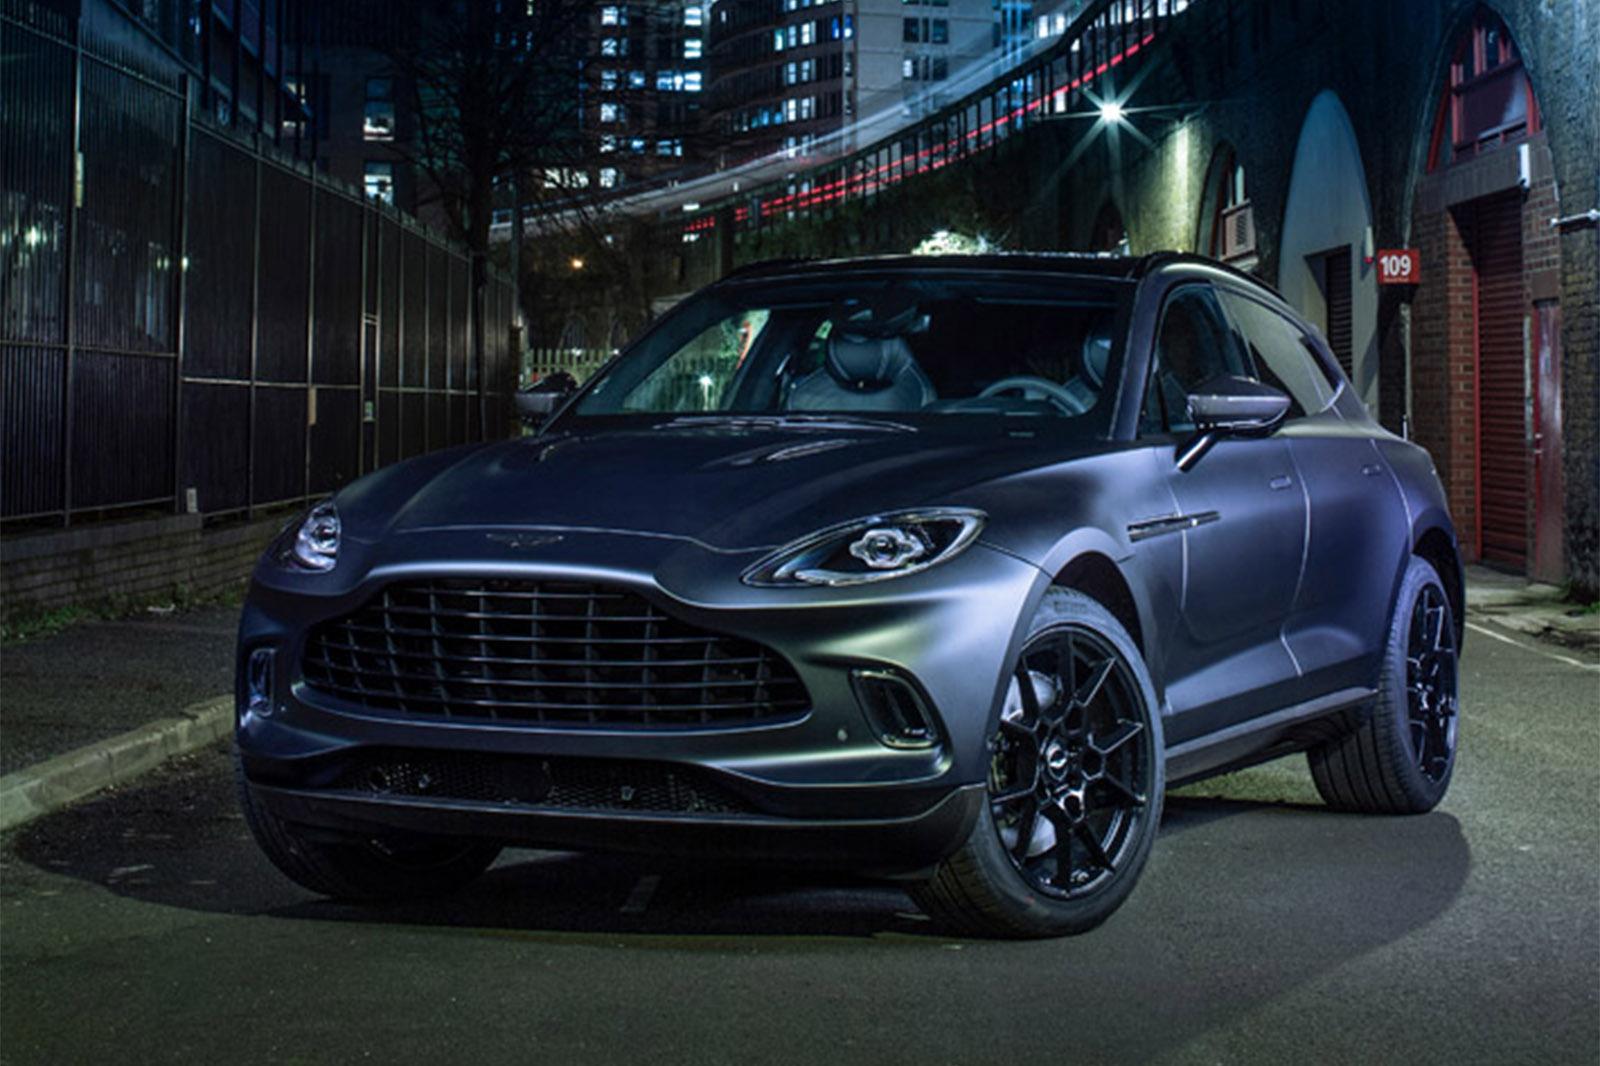 Aston Martin übernahme